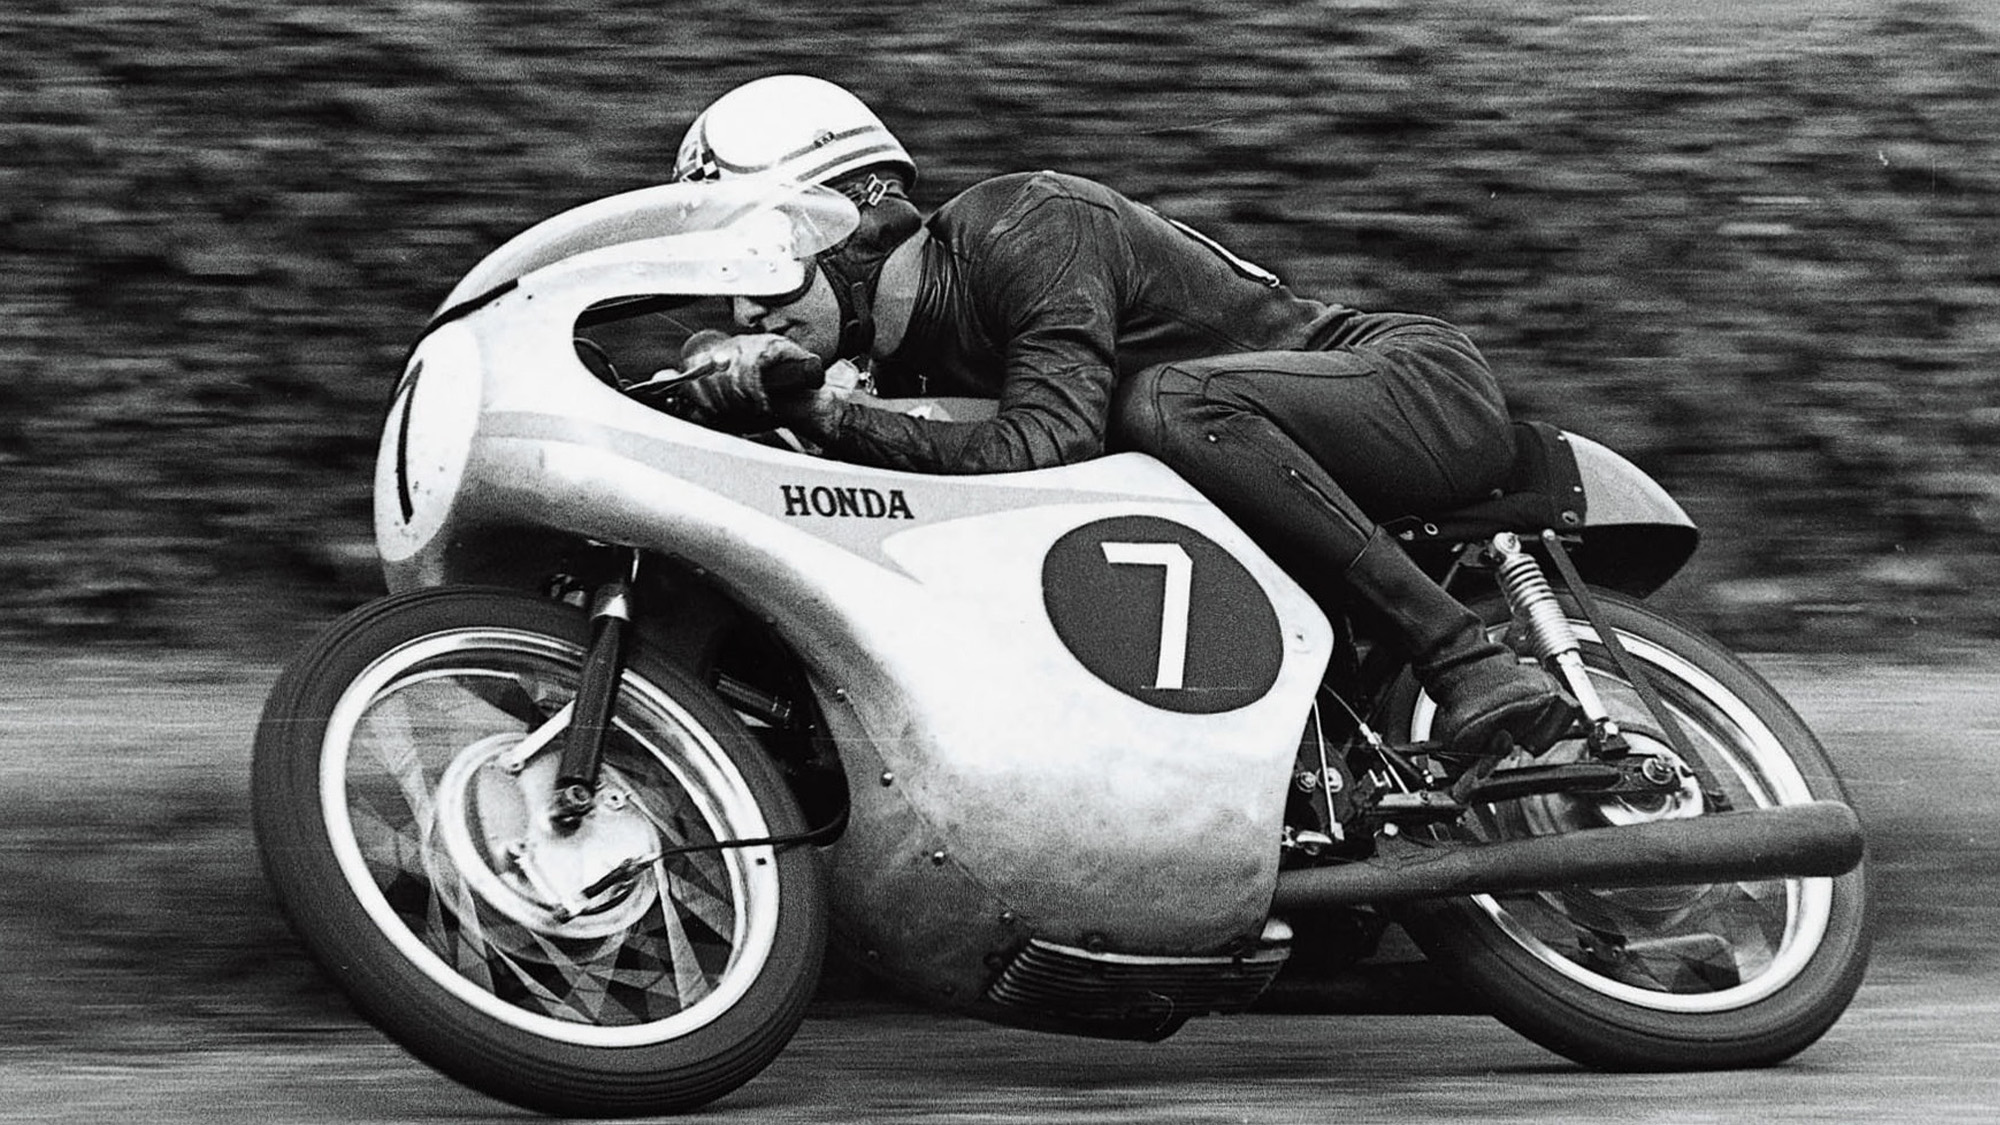 Mike Hailwood in the 1961 Isle of Man TT